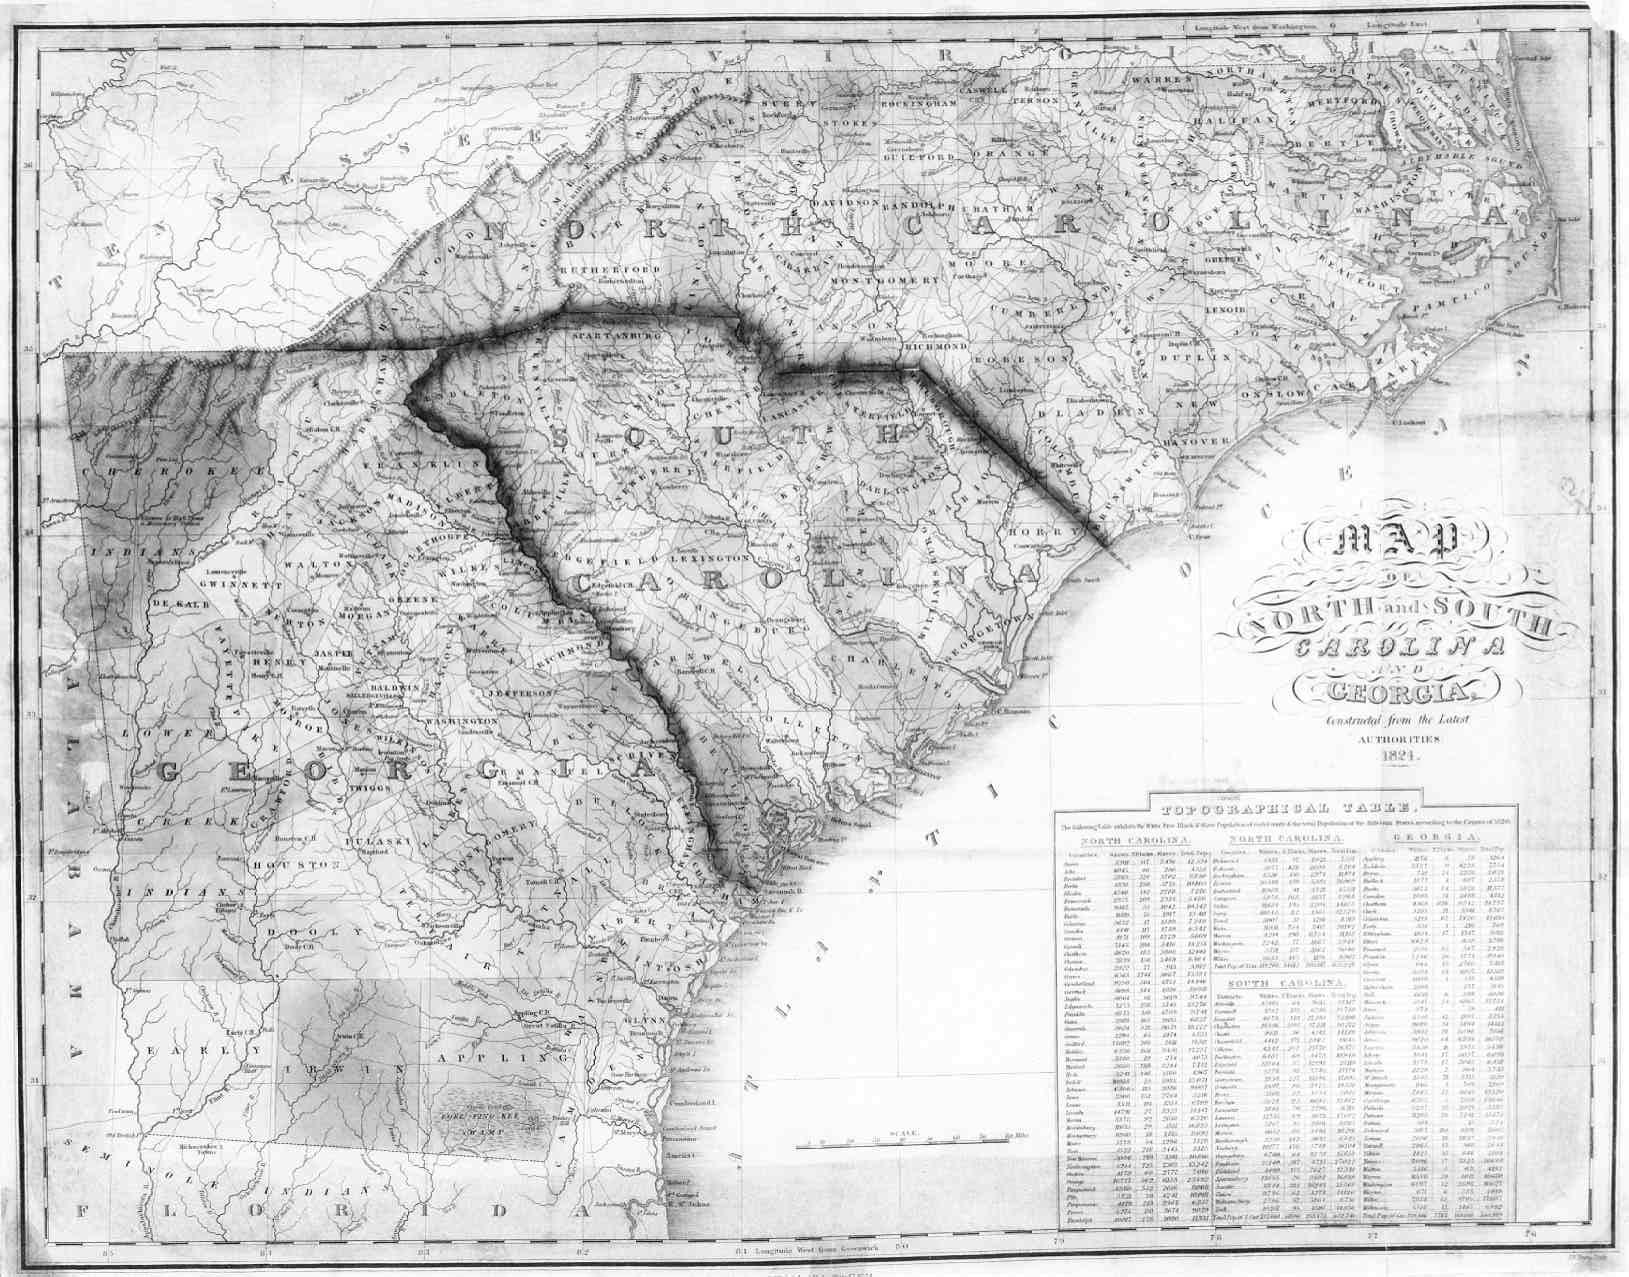 1824 Map of North Carolina, South Carolina, and Georgia ... Sc Ga Map on north carolina earthquake fault line map, ga co map, ga nv map, ga nc map, ga regions map, ga district map, ga tn map, ga elevation map, ga state map, ga fl map, ga interstate map, ga road map, georgia and florida road map, athens ga map, ga al map, ga st map, south carolina map, south ga cities map, ga rivers map, ga ala map,